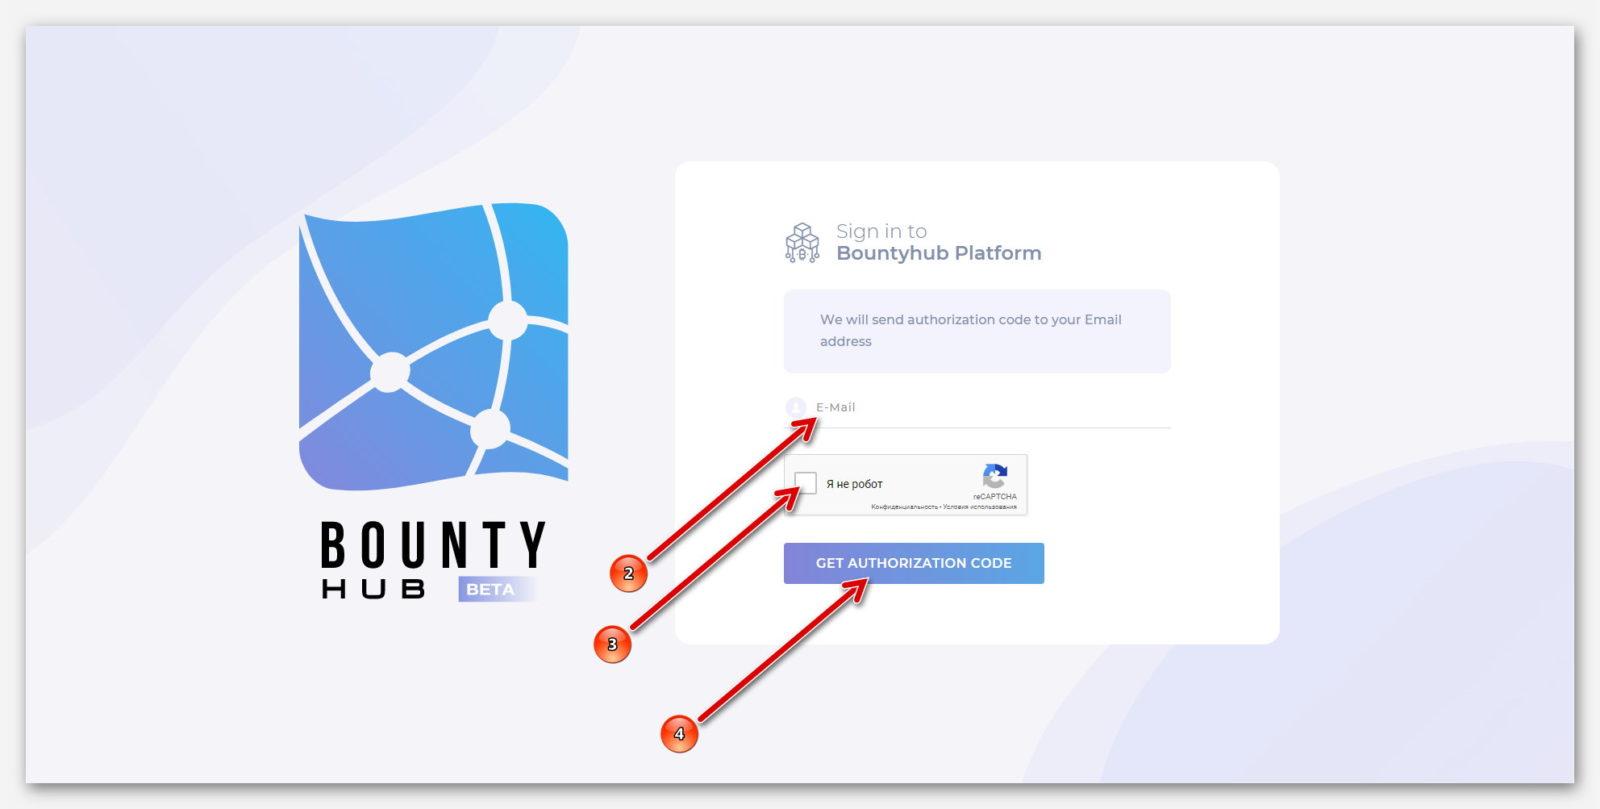 Регистрация на платформе BountyHub